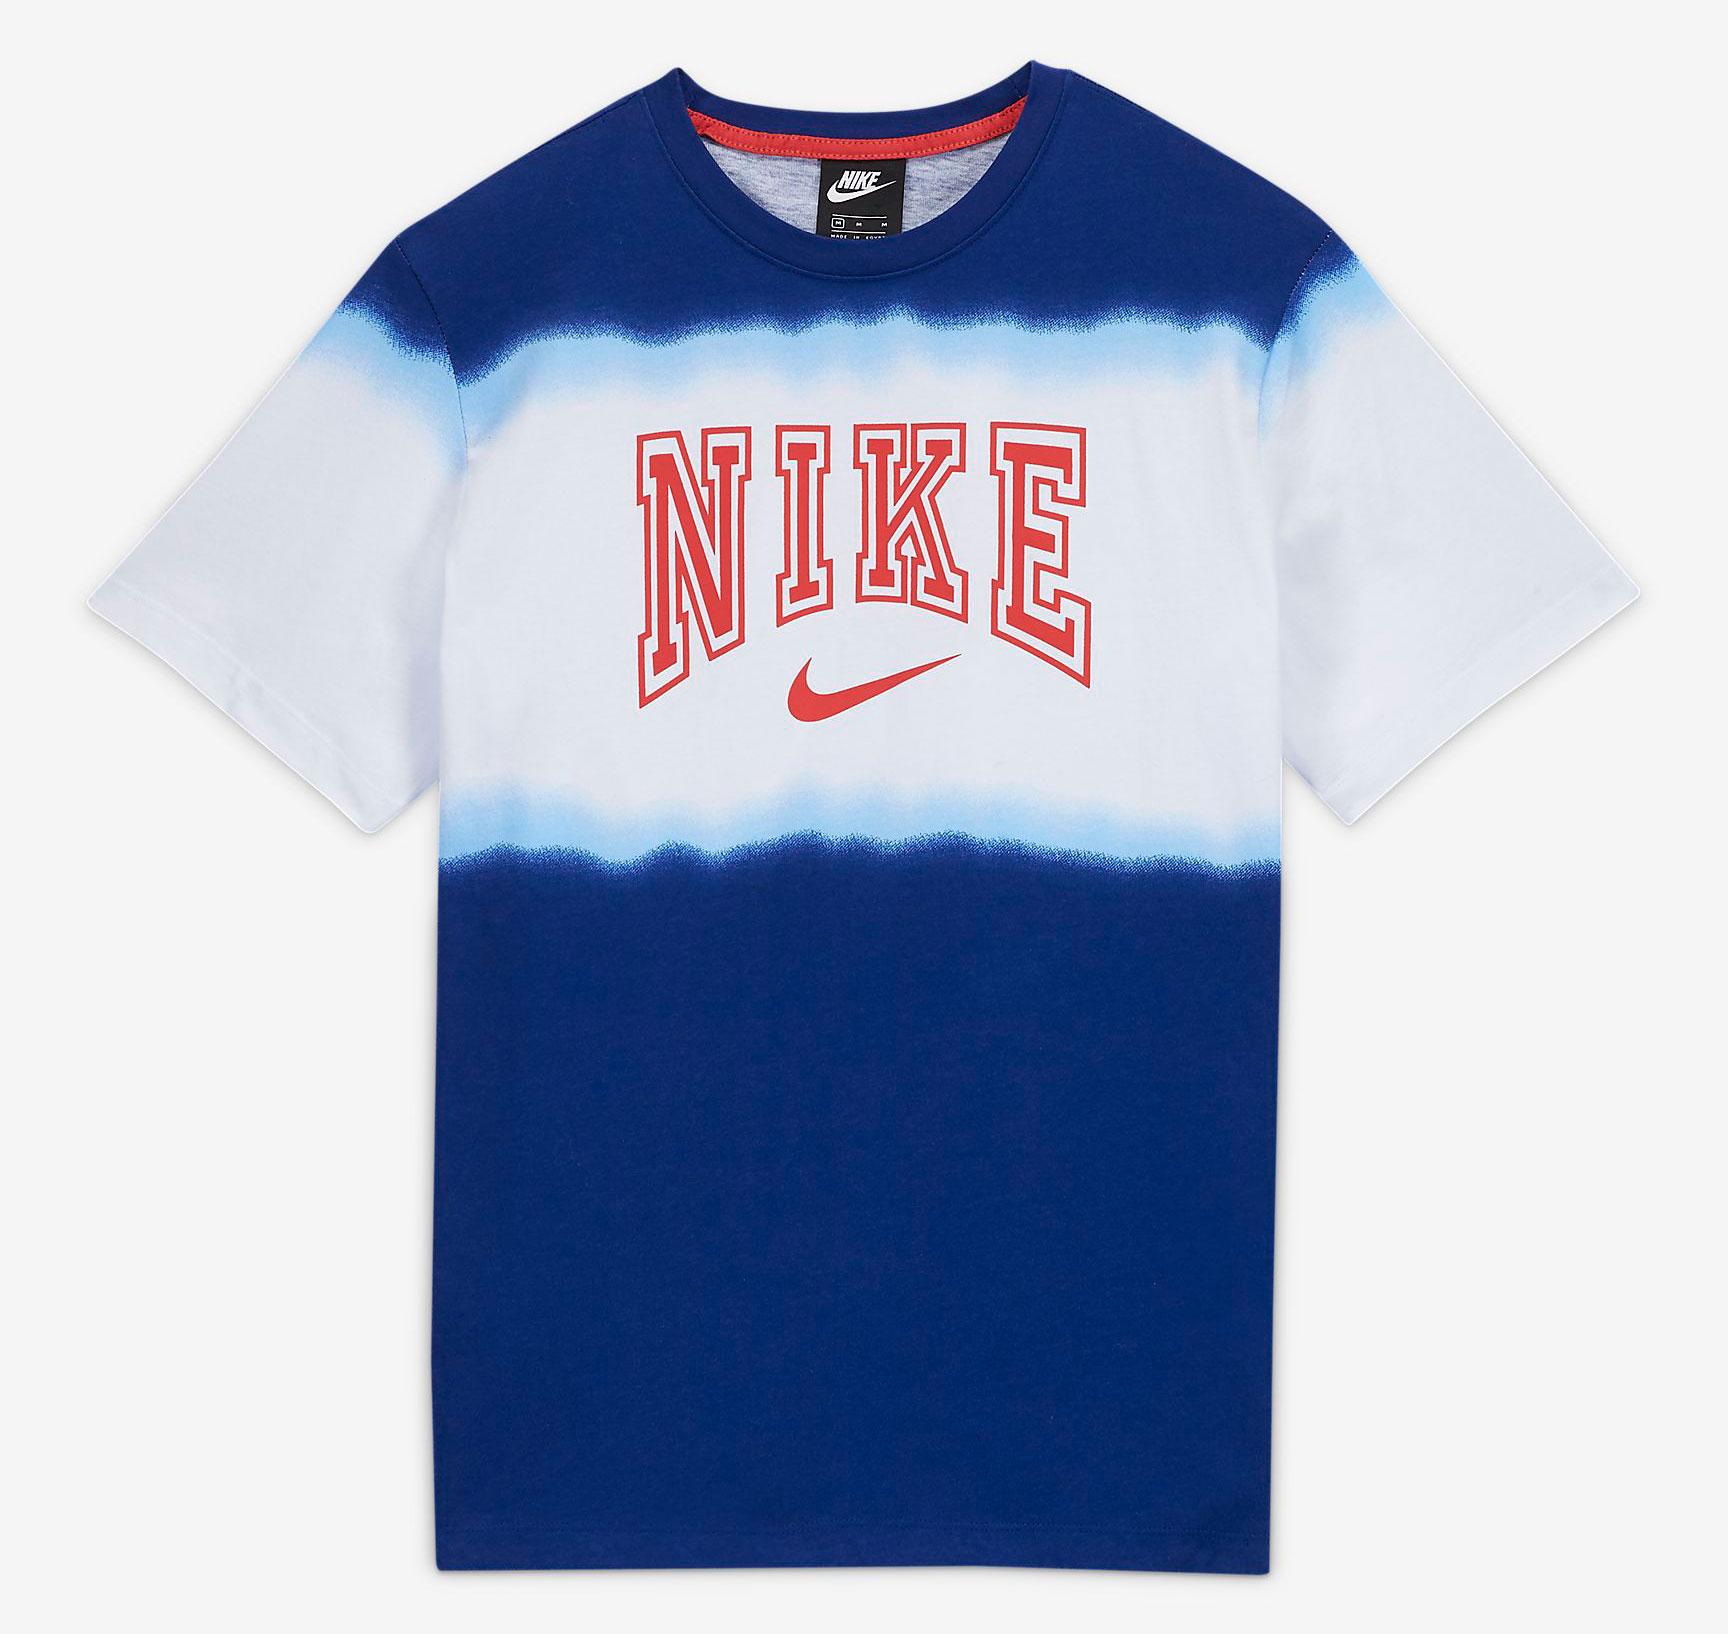 nike-sportswear-usa-americana-tie-dye-tee